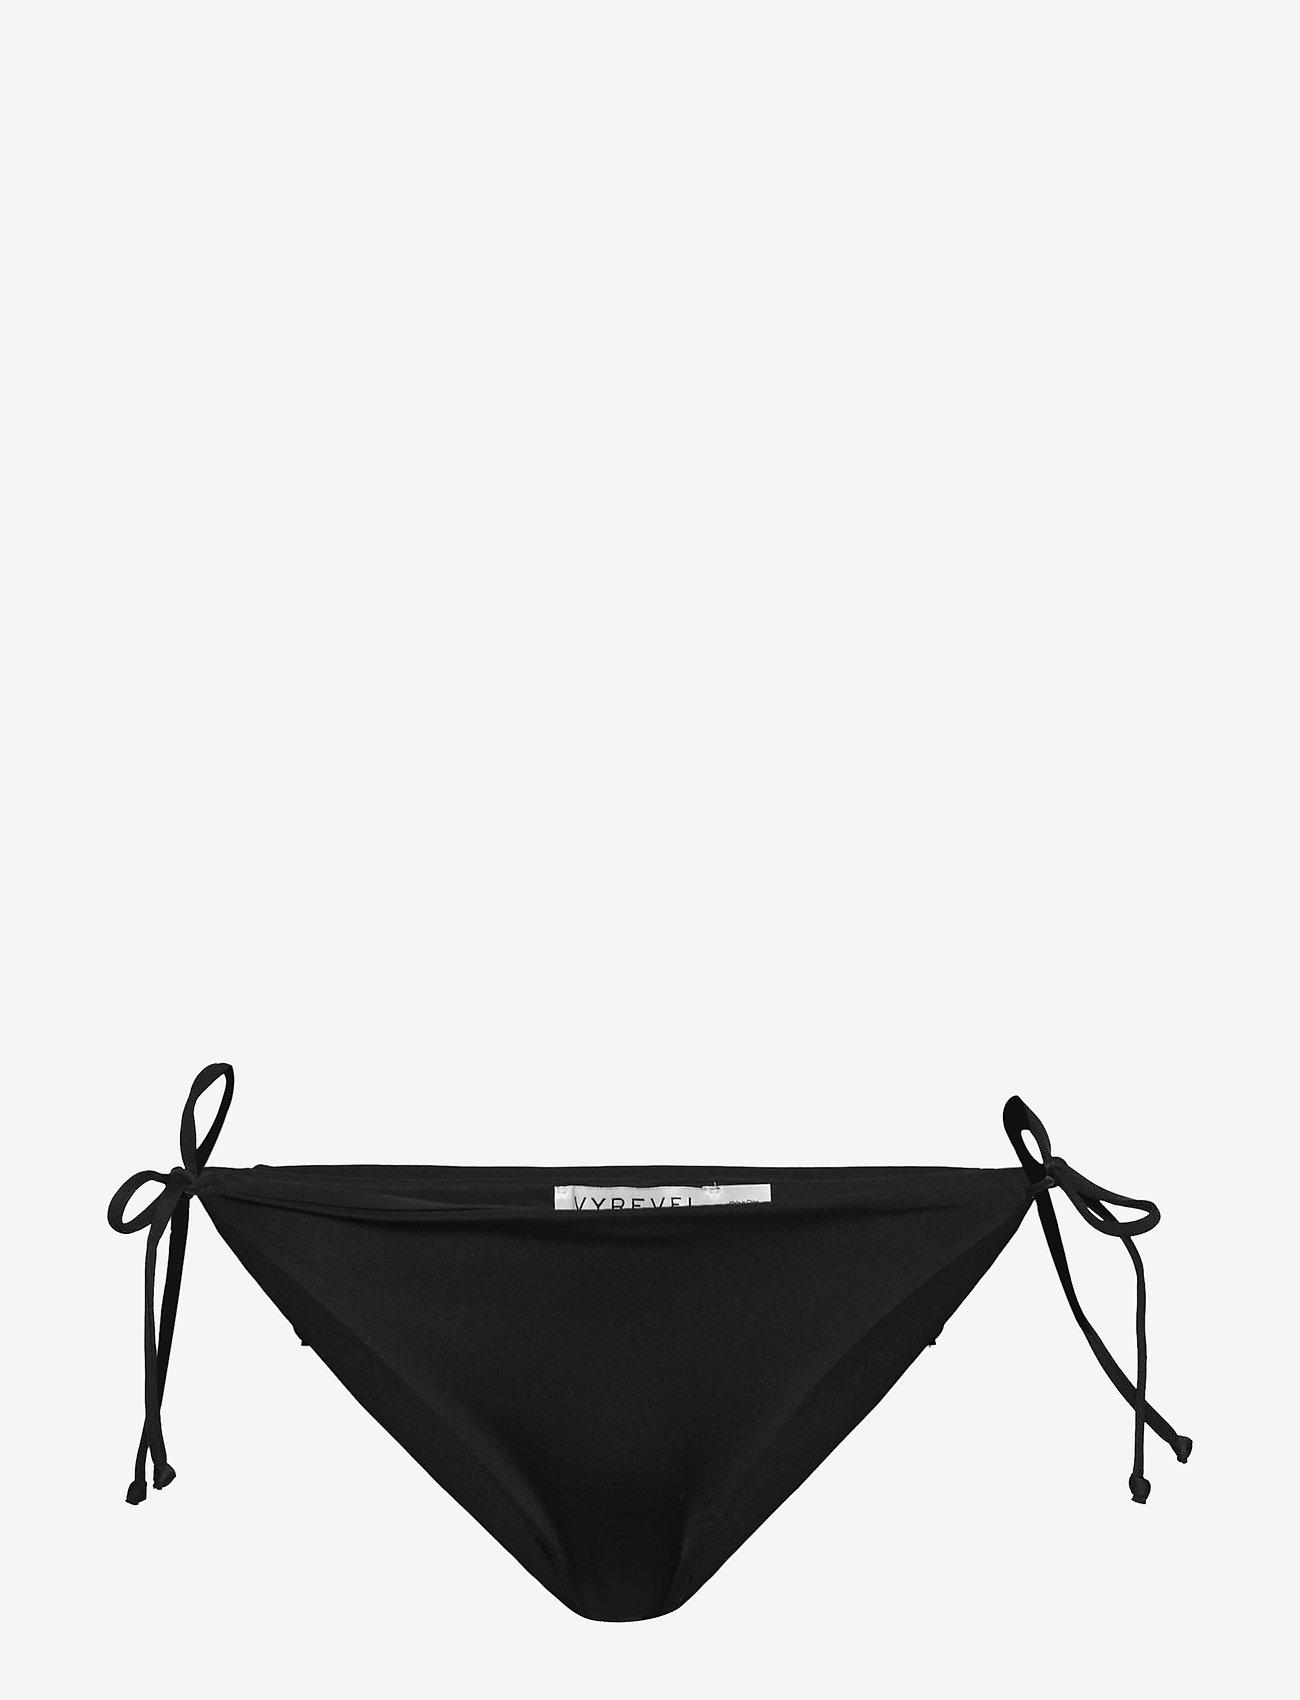 Ivyrevel - ST BARTHS BIKINI BOTTOM - bikinialaosat - black